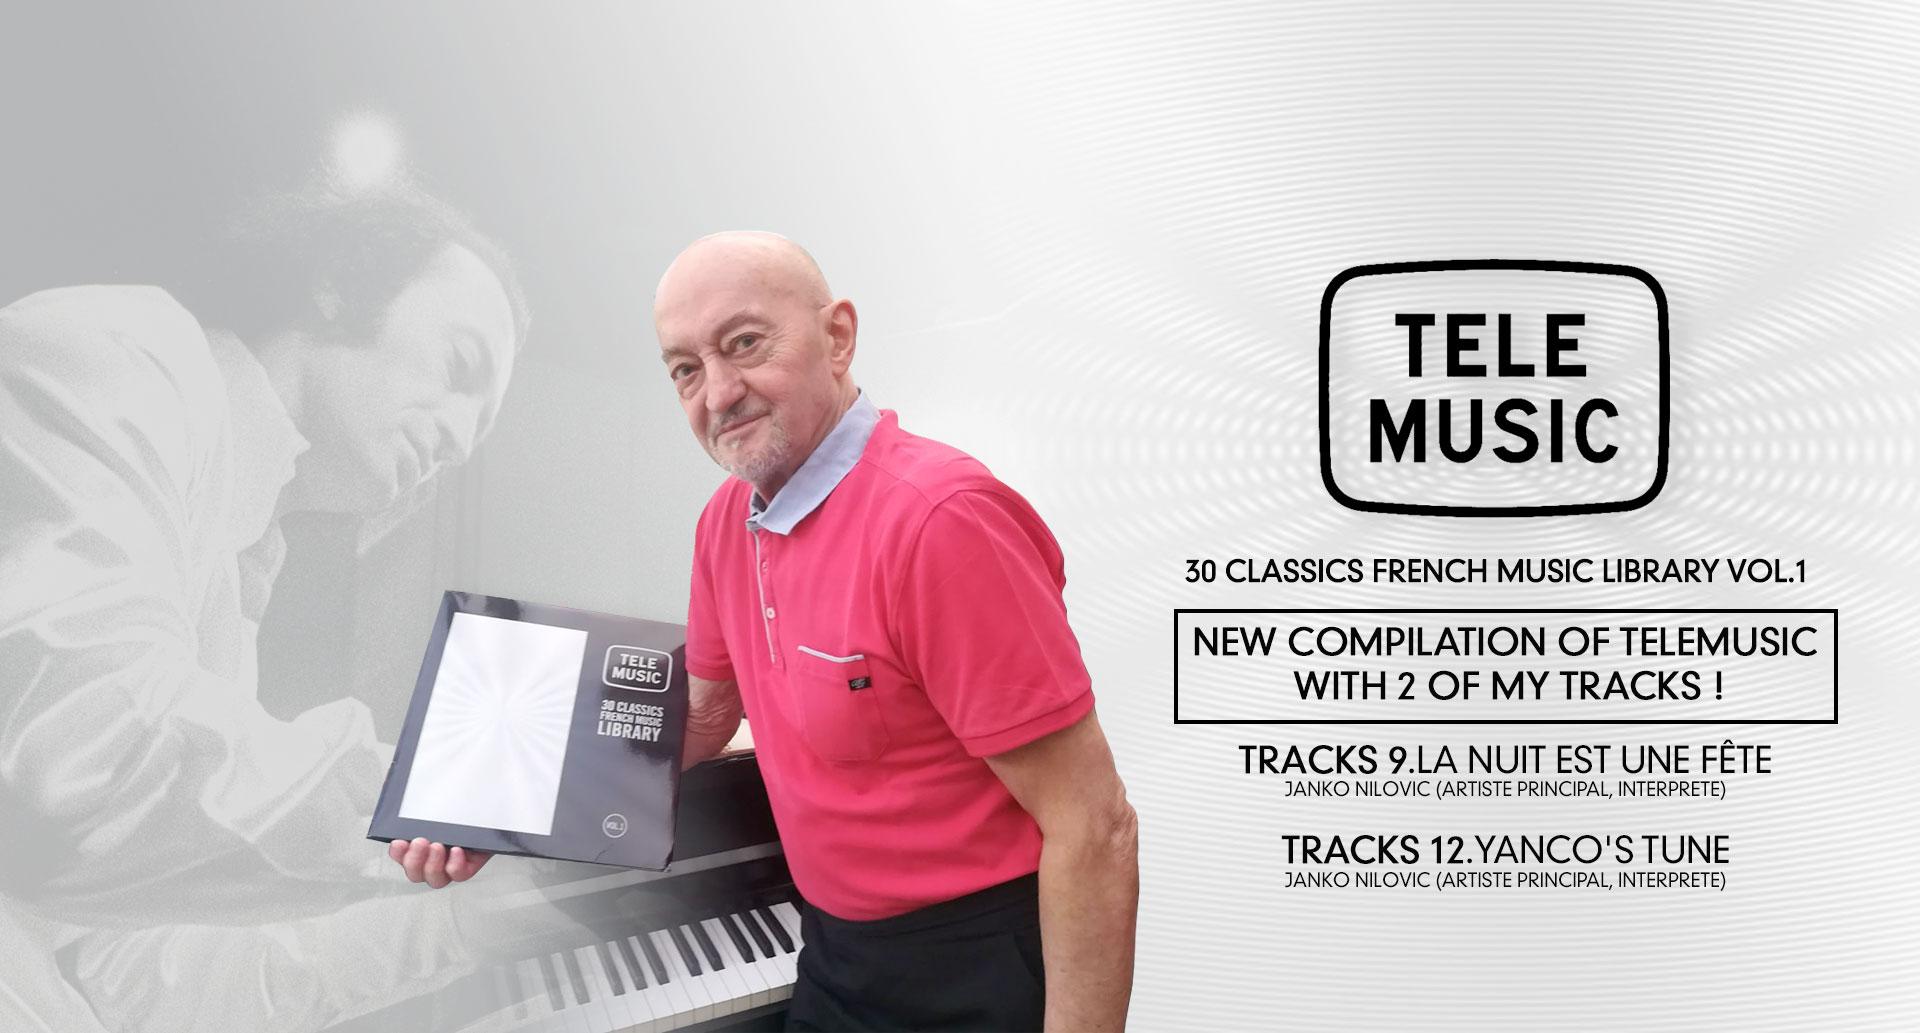 janko-nilovic-tele-music